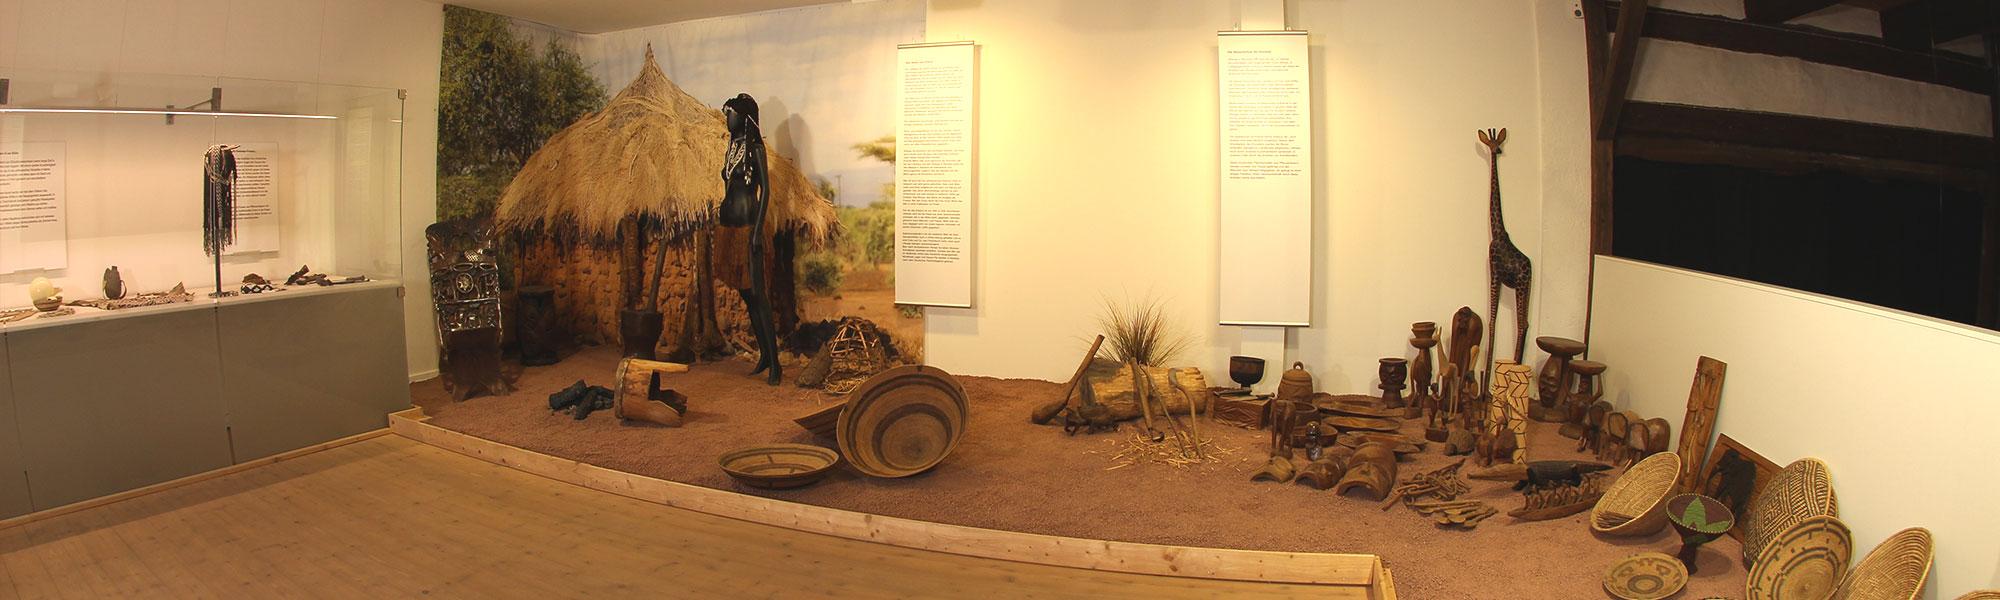 museum-auberlehaus-trossingen-afrika-headerbild